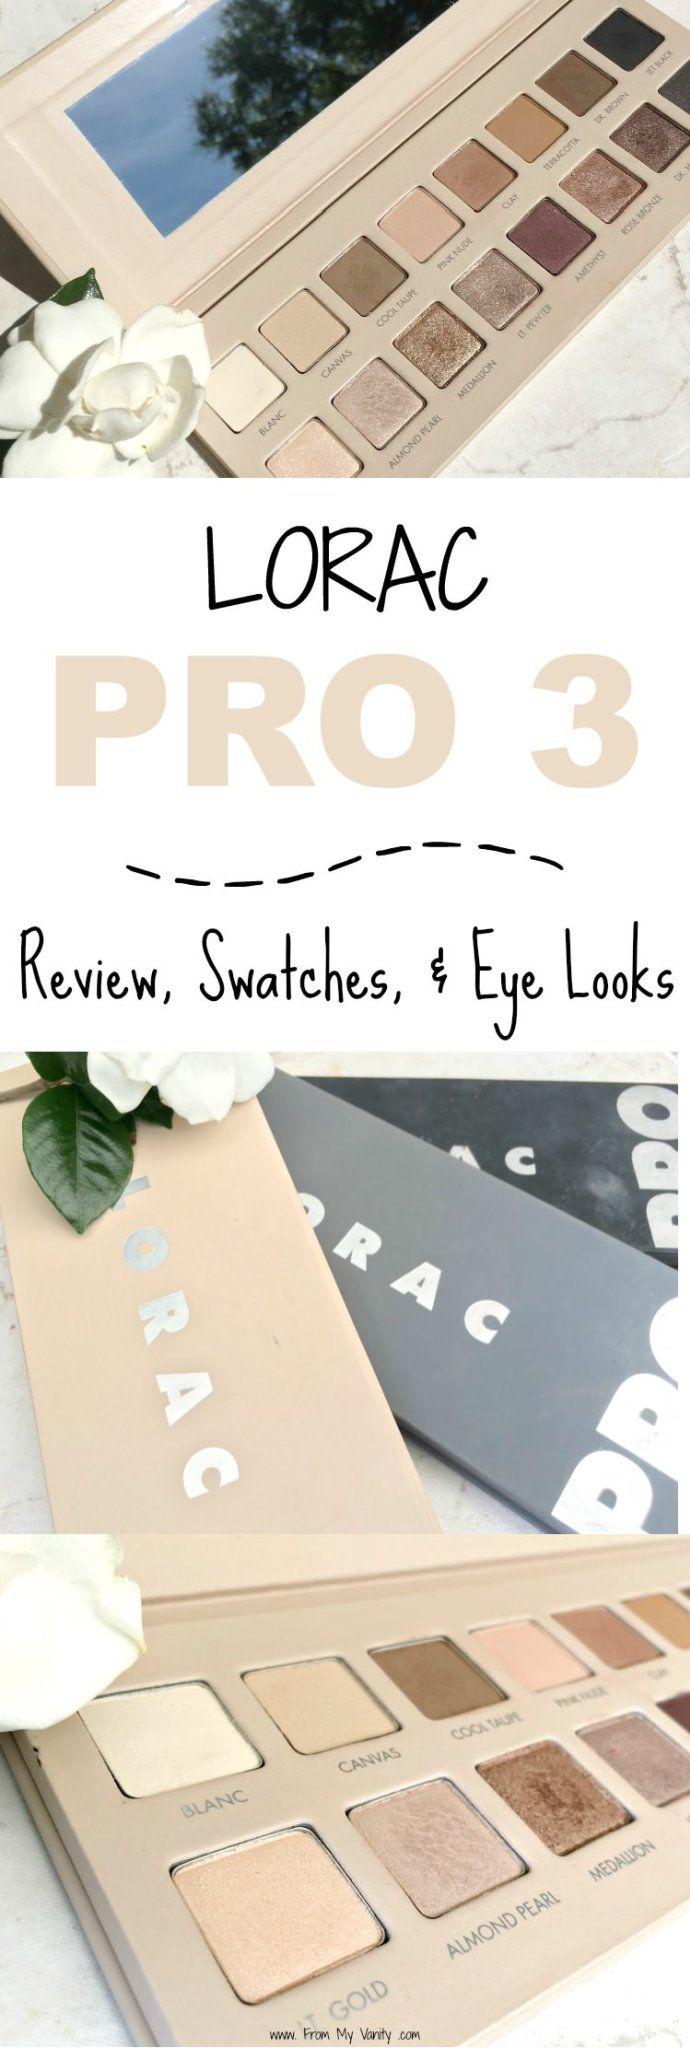 The LORAC PRO 3 palette looks stunning -- like a nude lovers dream!